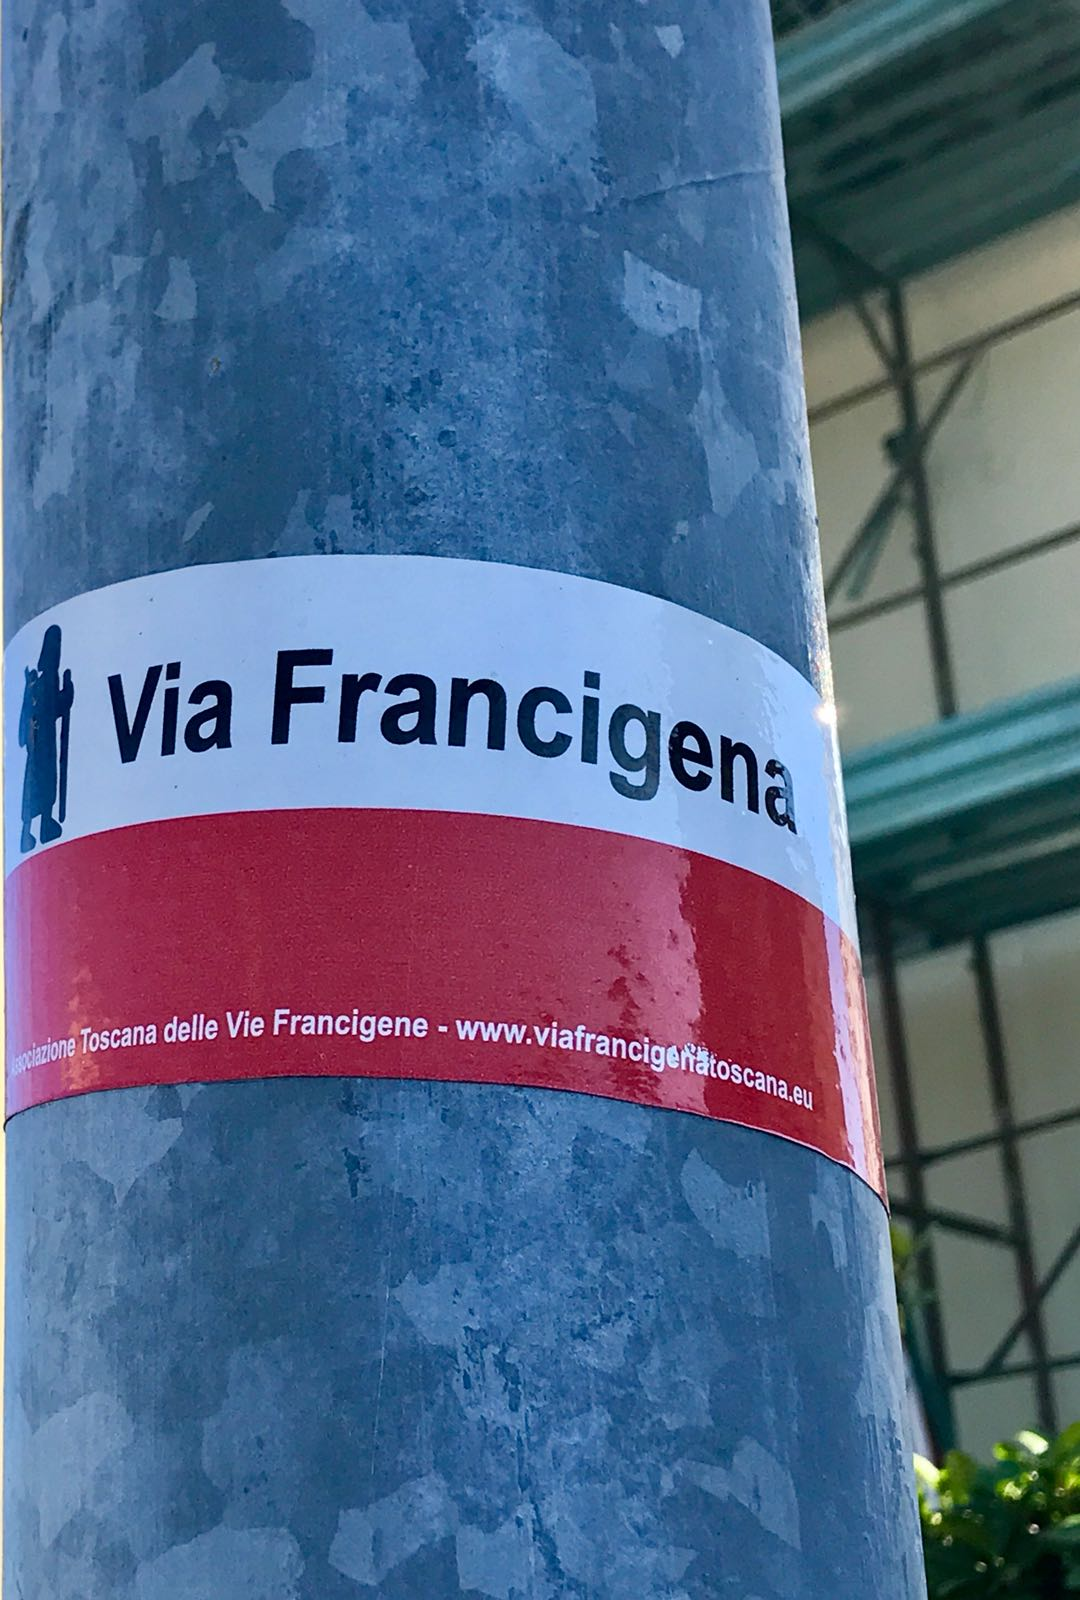 Sticker marking the Via Francigena route